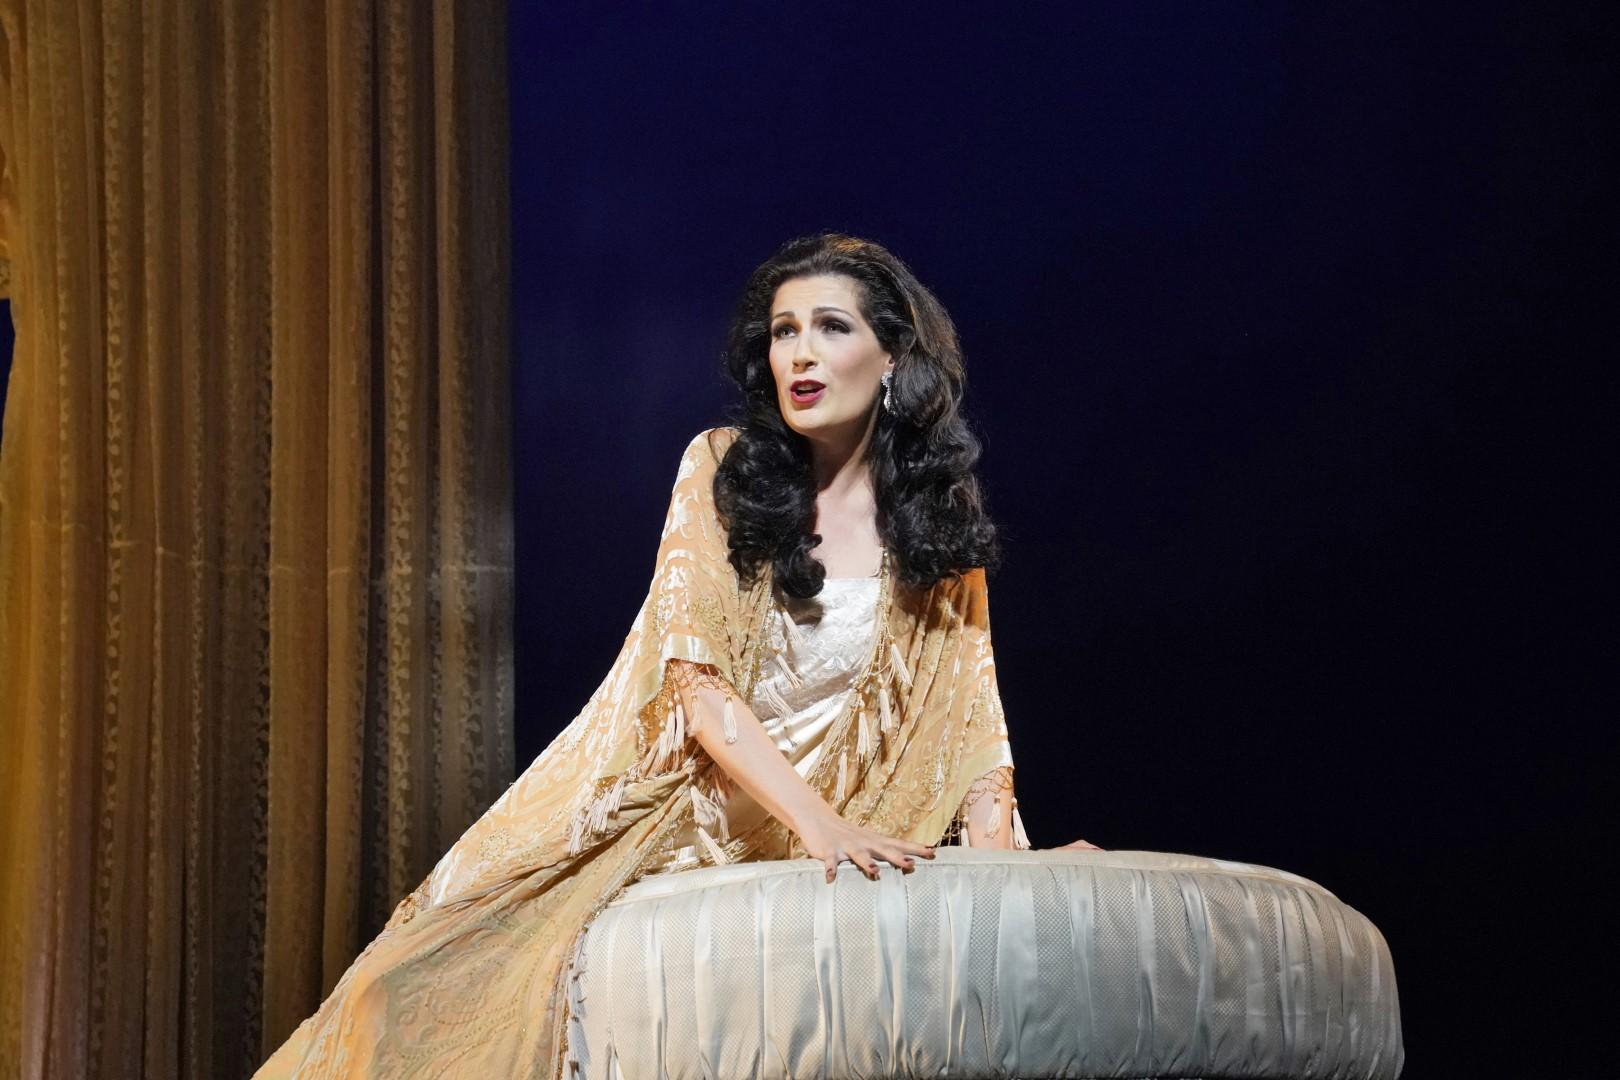 Soprano Adela Zaharia as Violetta